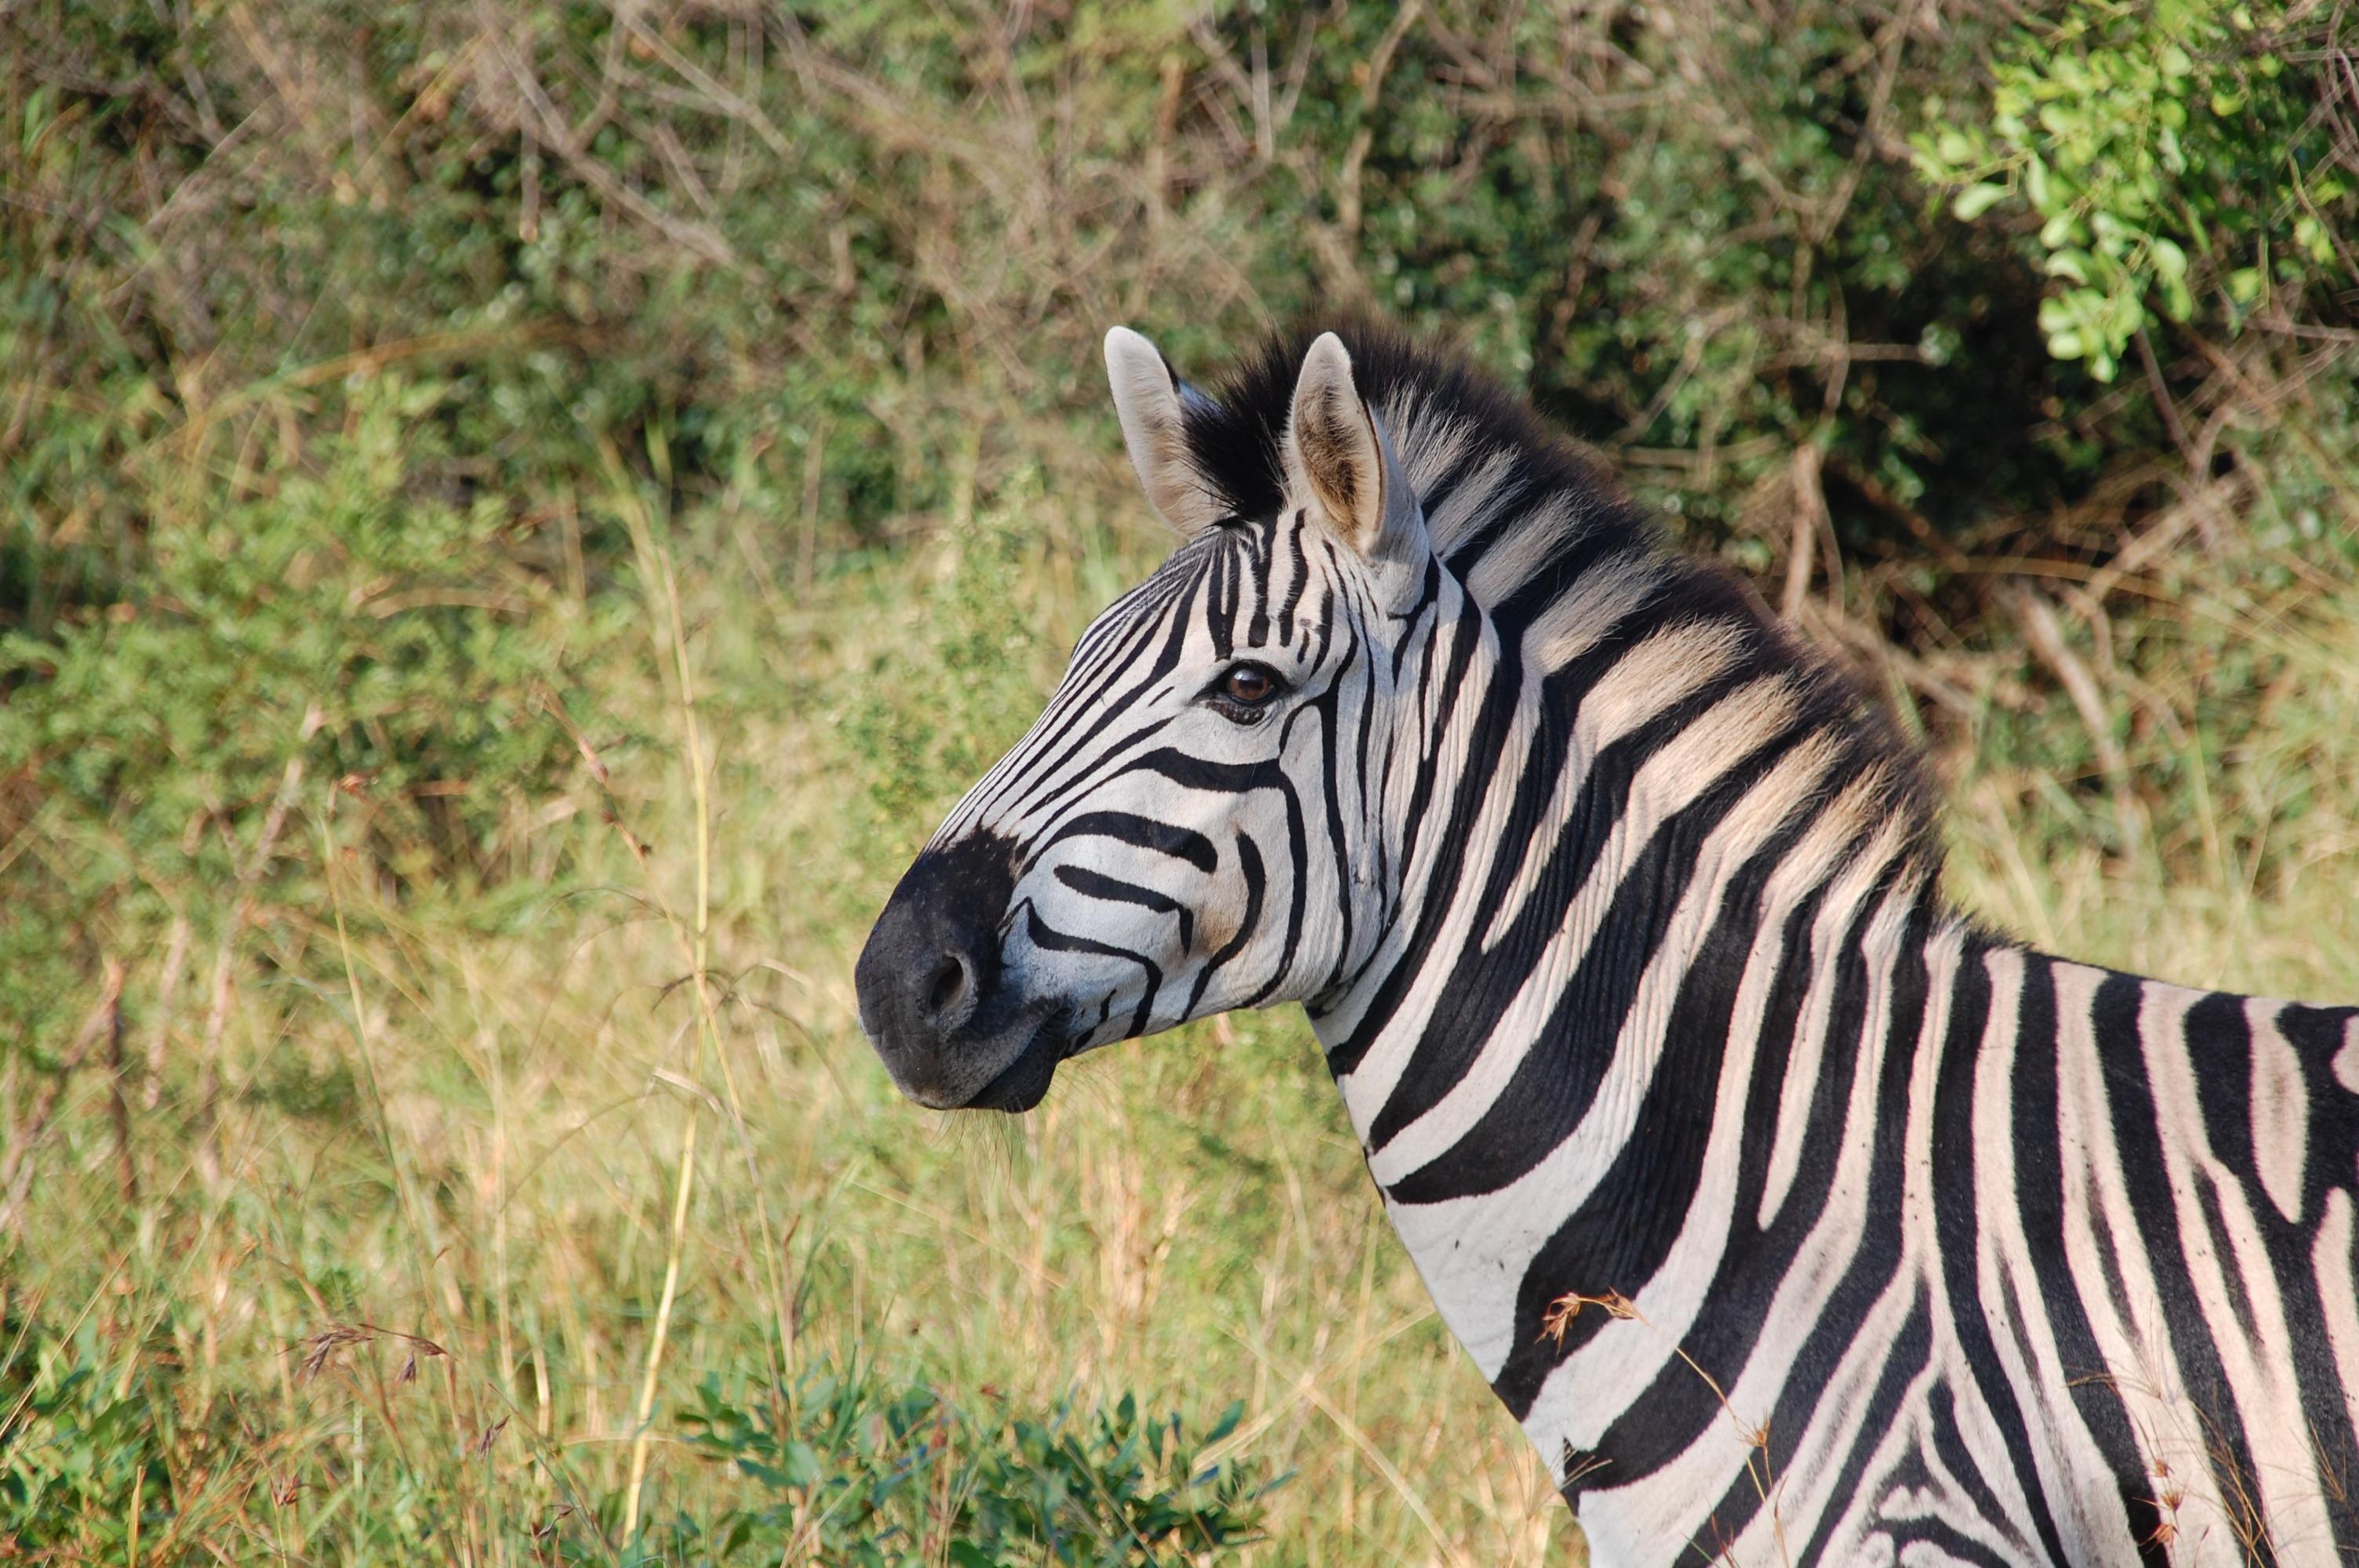 south-africa-wild-nature-wildlife-68162